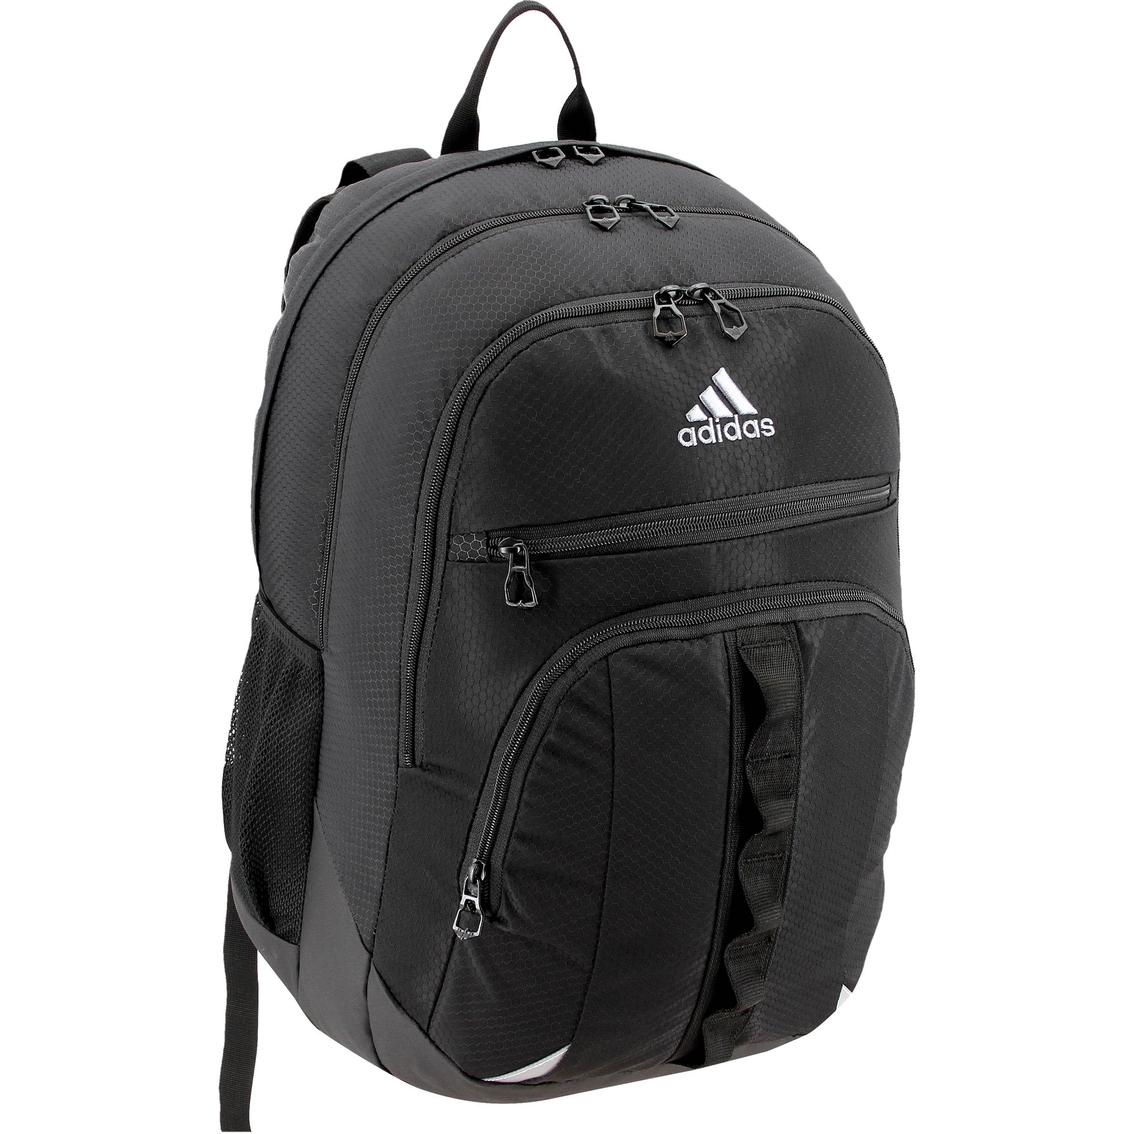 7aa0a81318a Adidas Prime Iii Backpack | Backpacks | More | Shop The Exchange